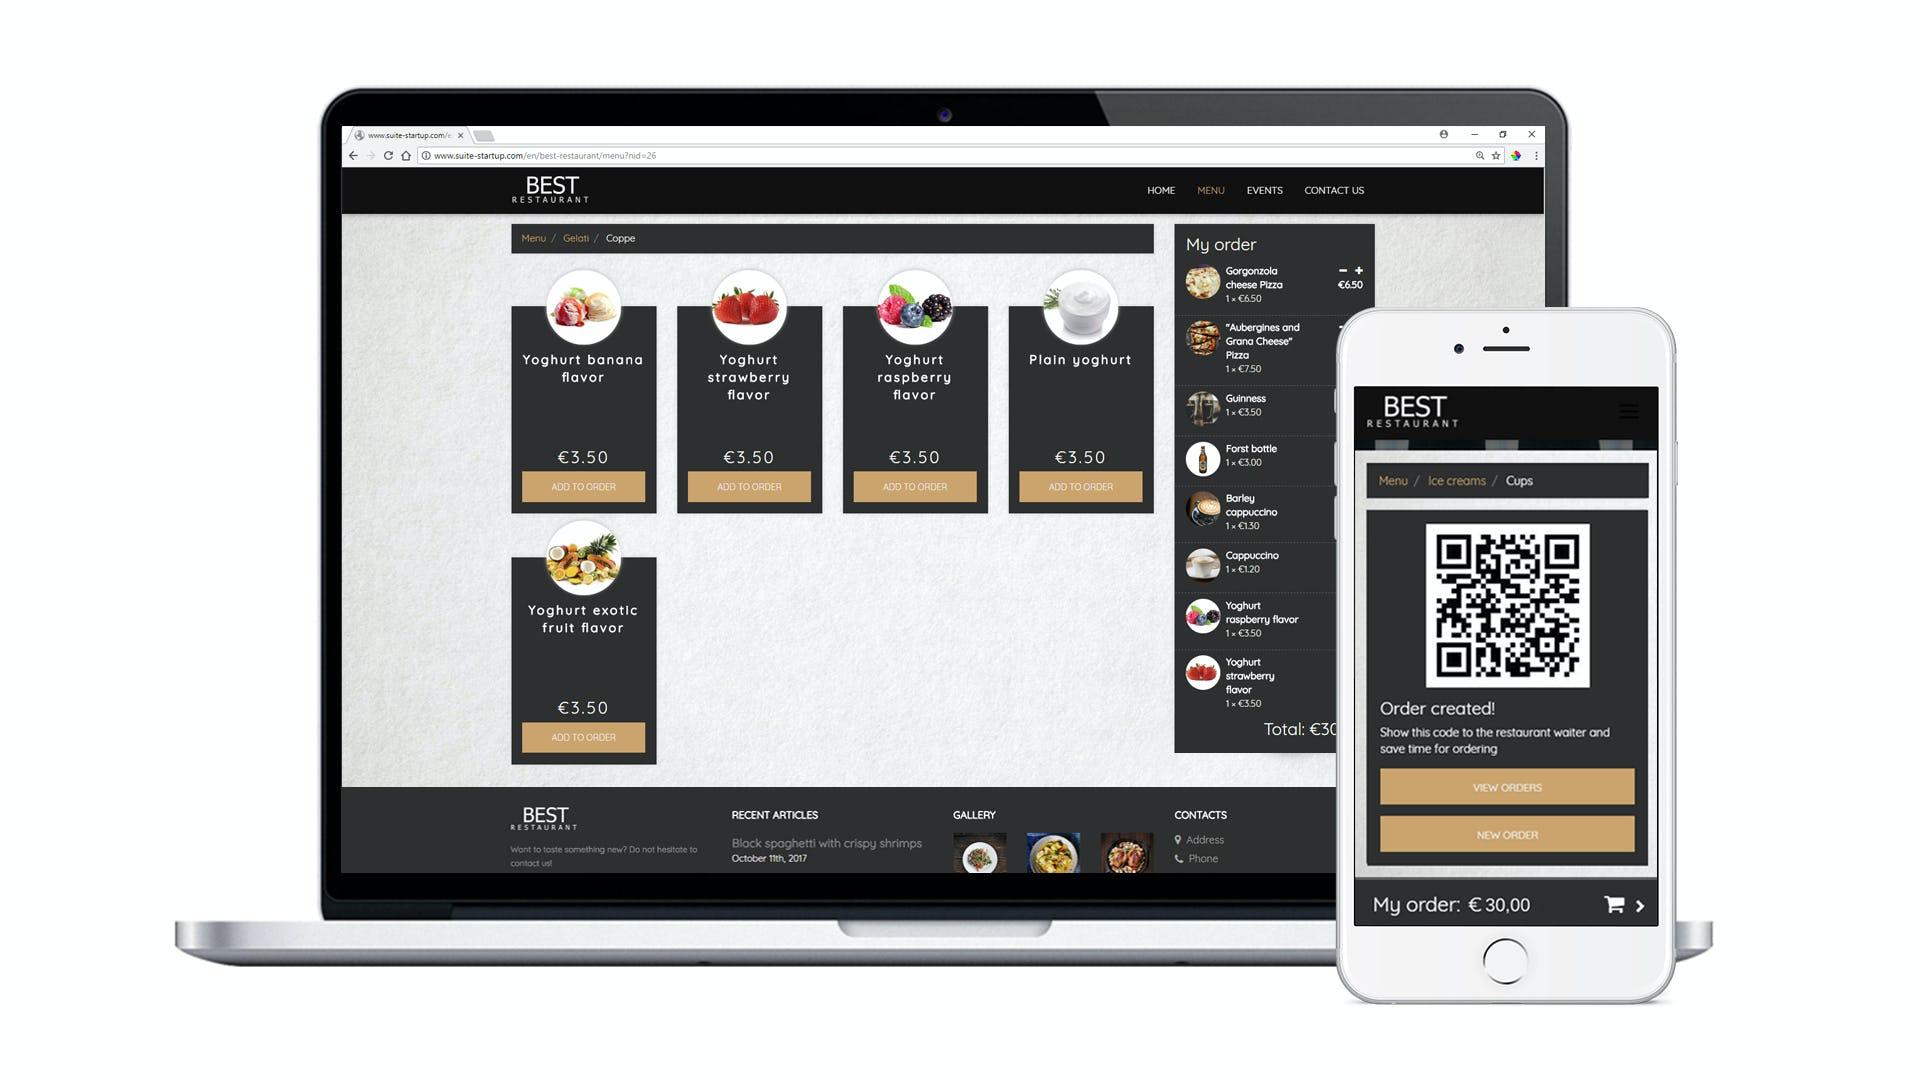 Suite 4 Software - Online ordering